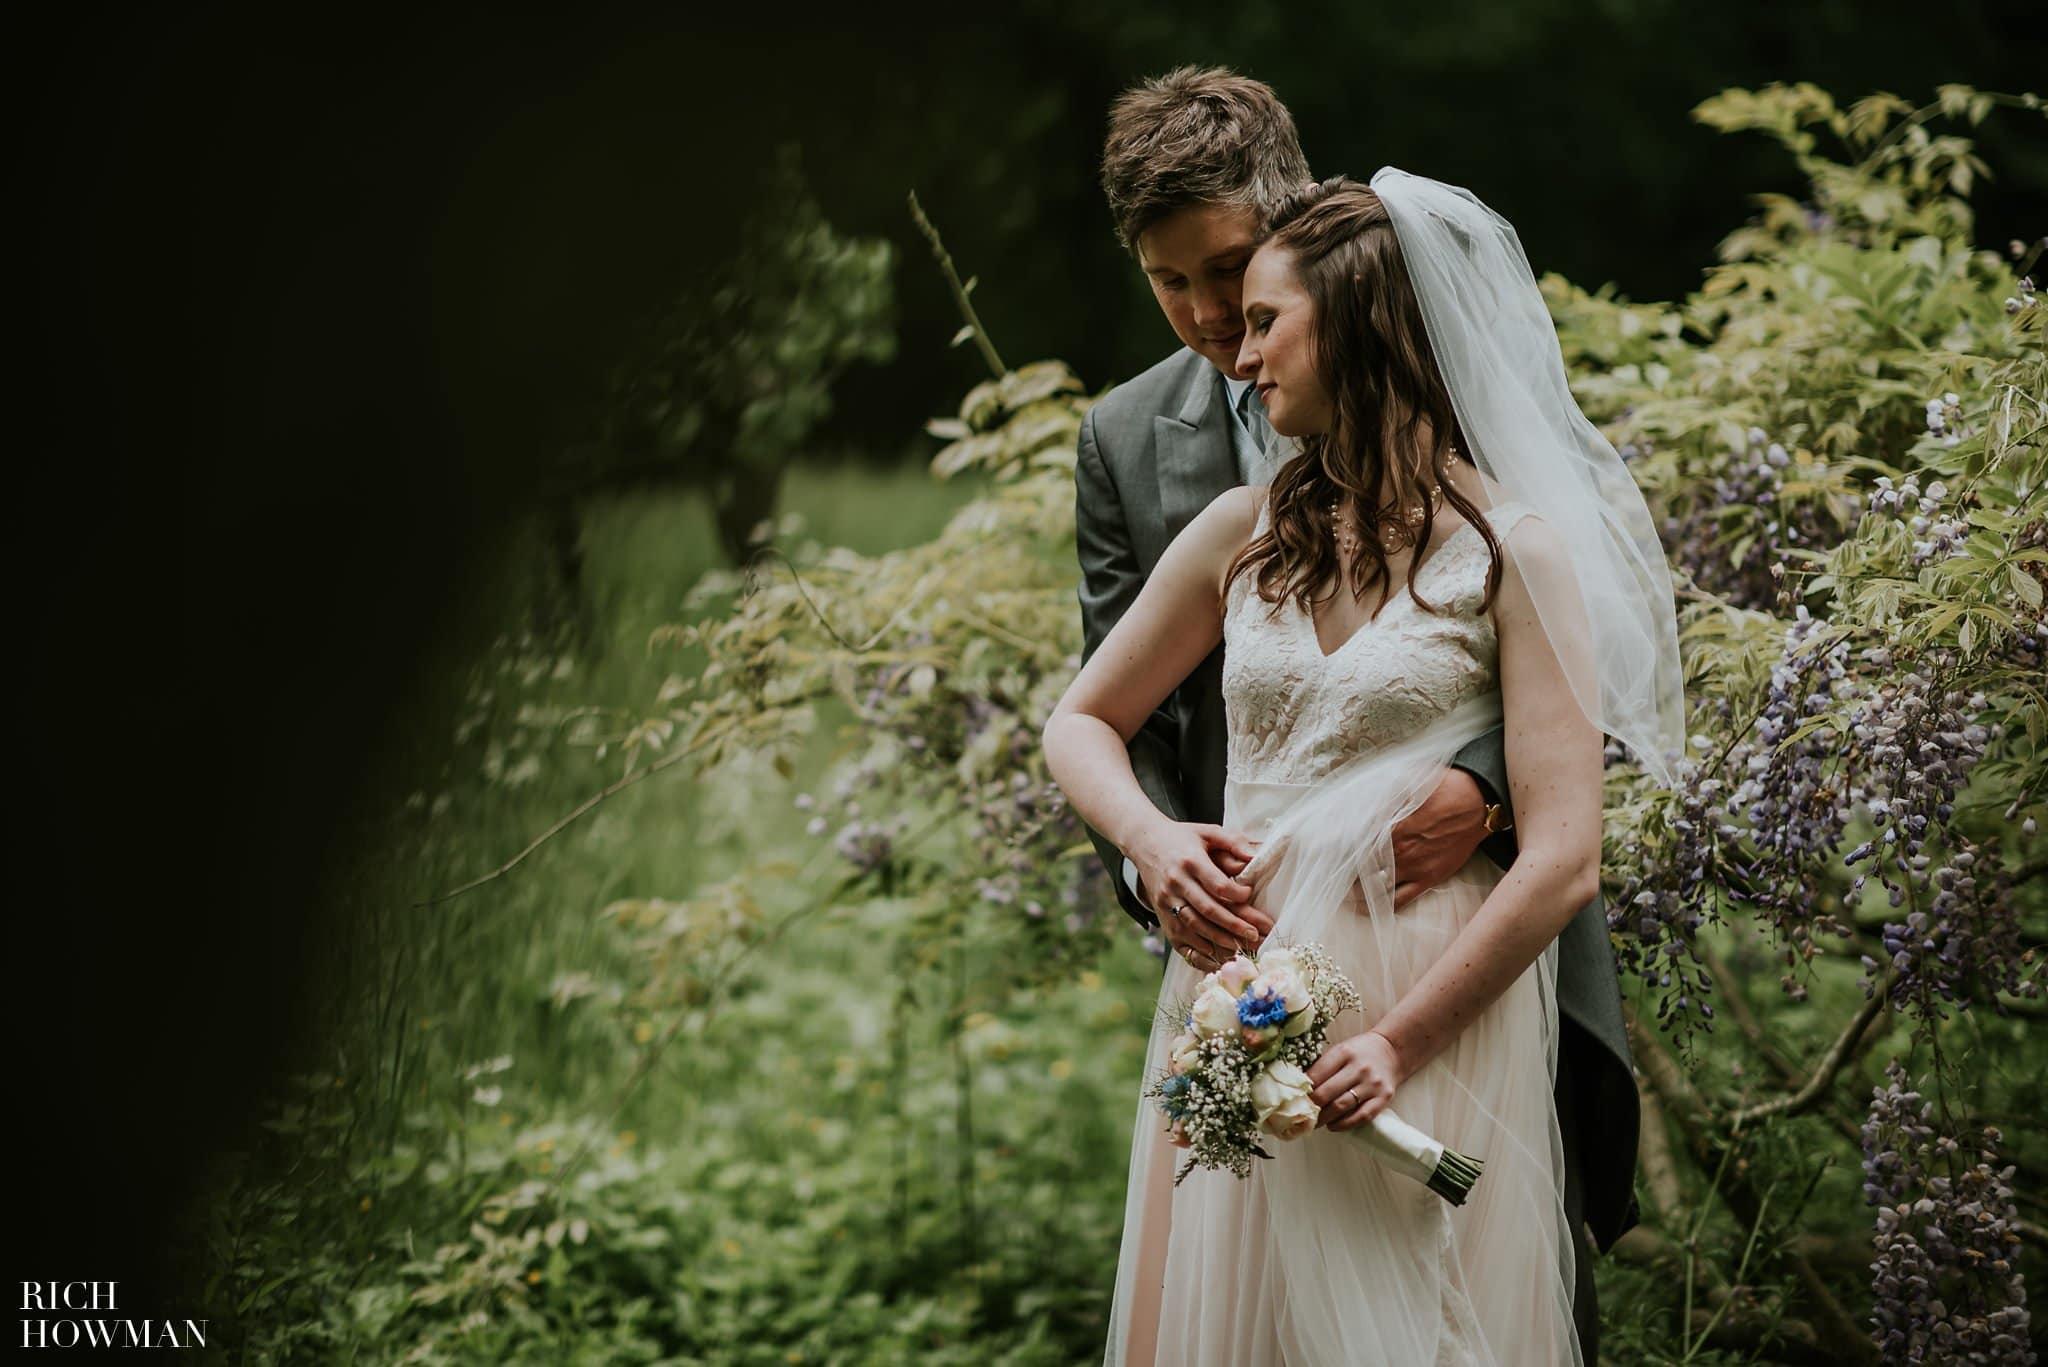 Wedding photography at Berwick Lodge